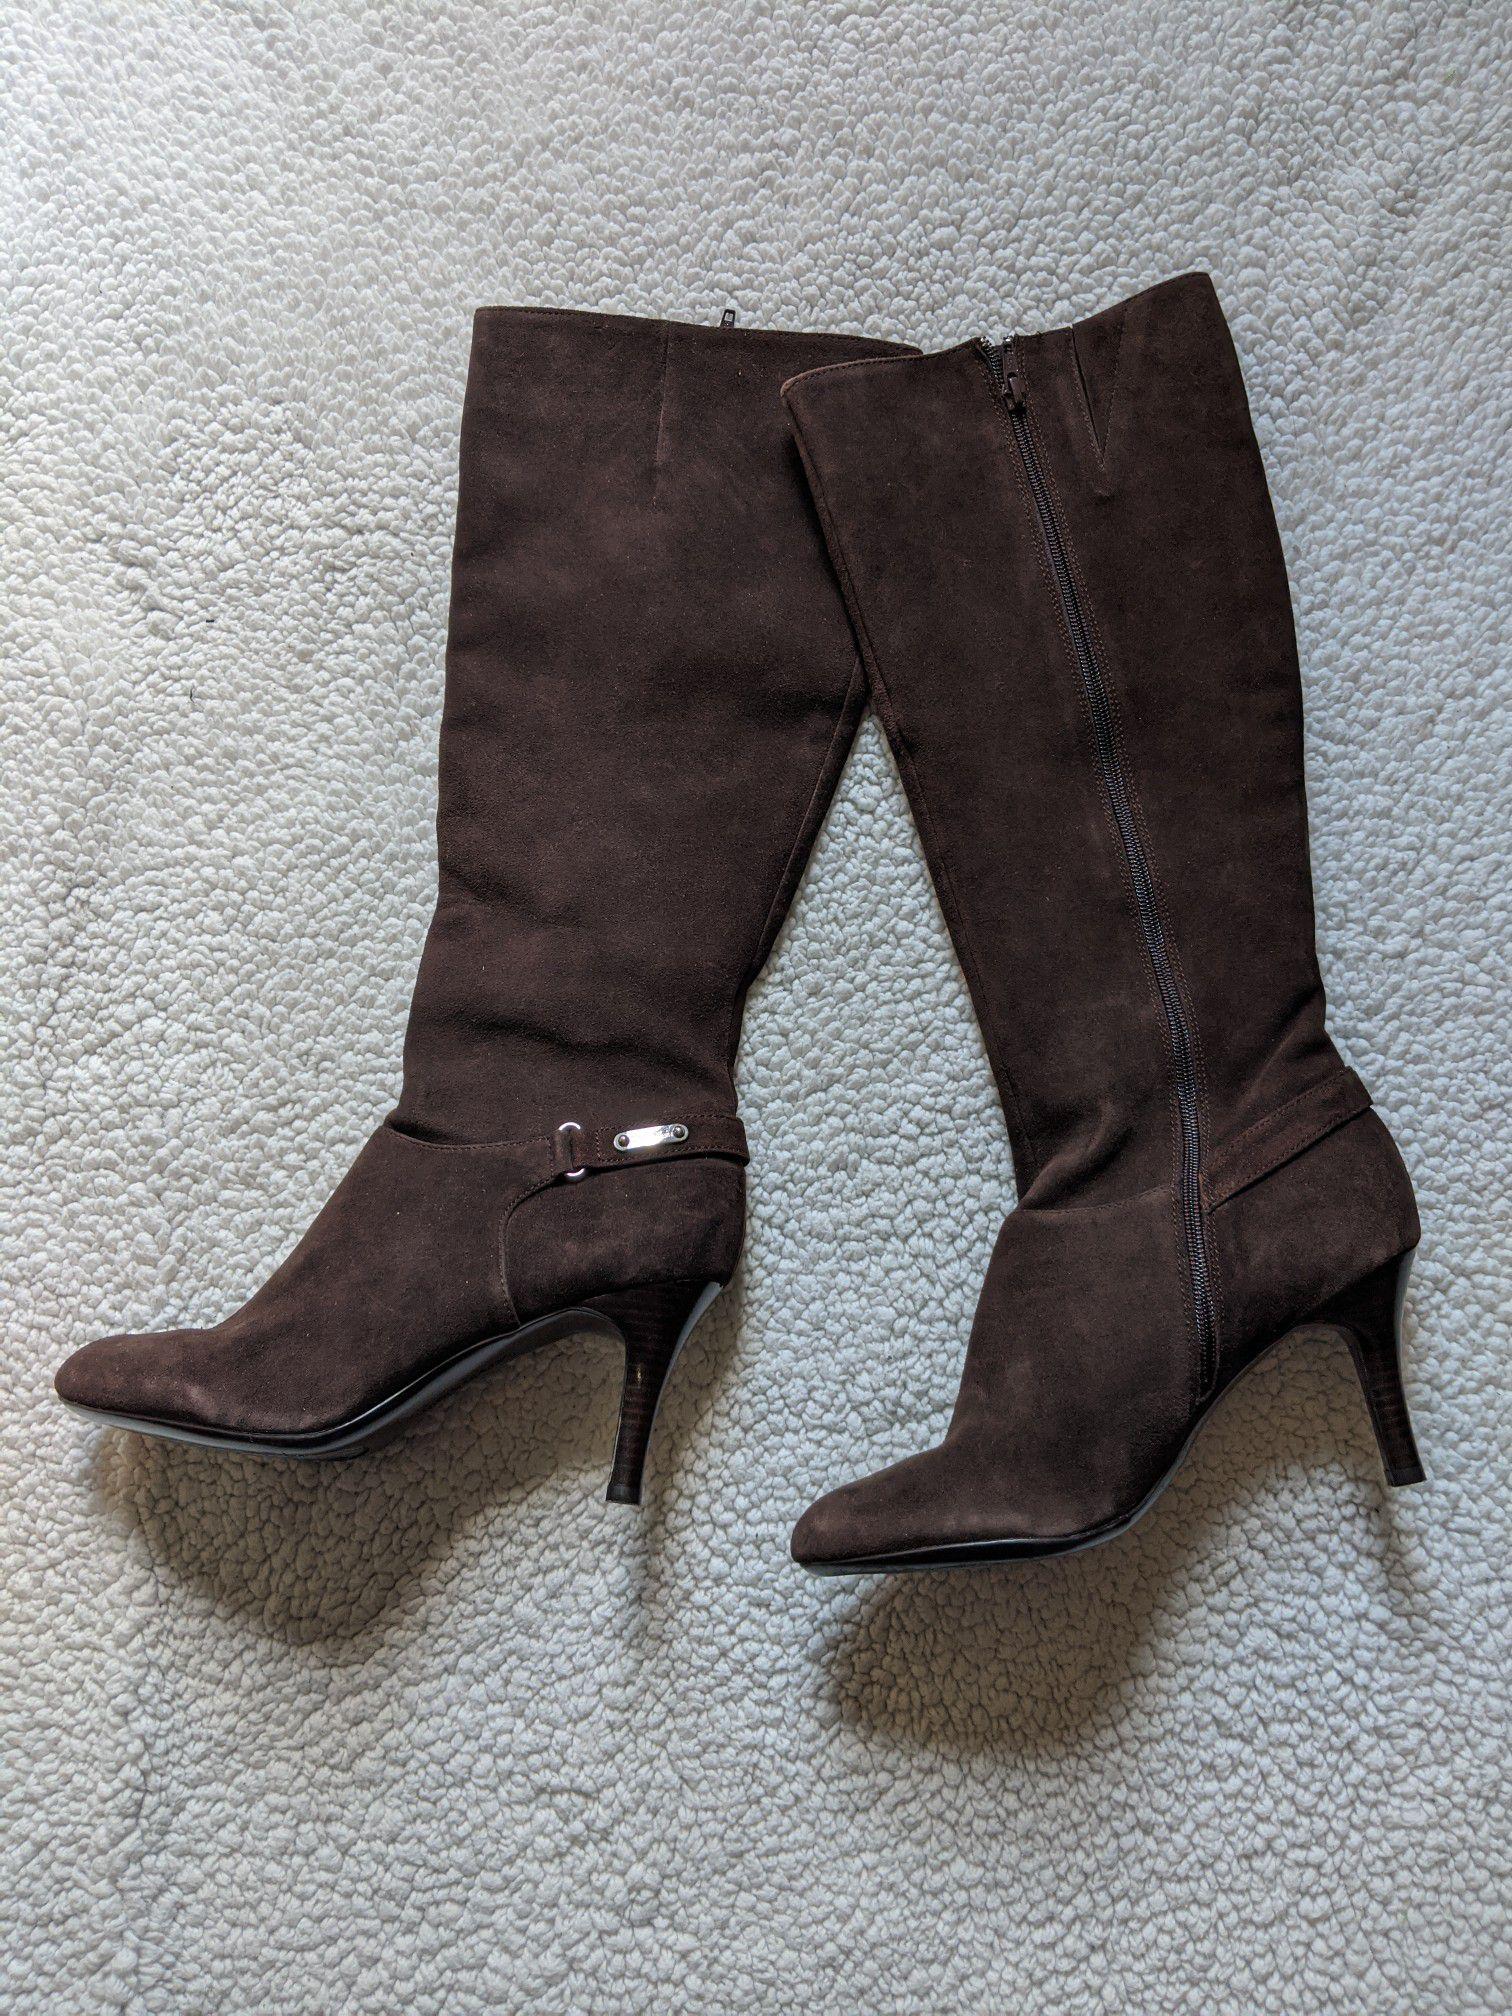 Boots- Calvin Klein